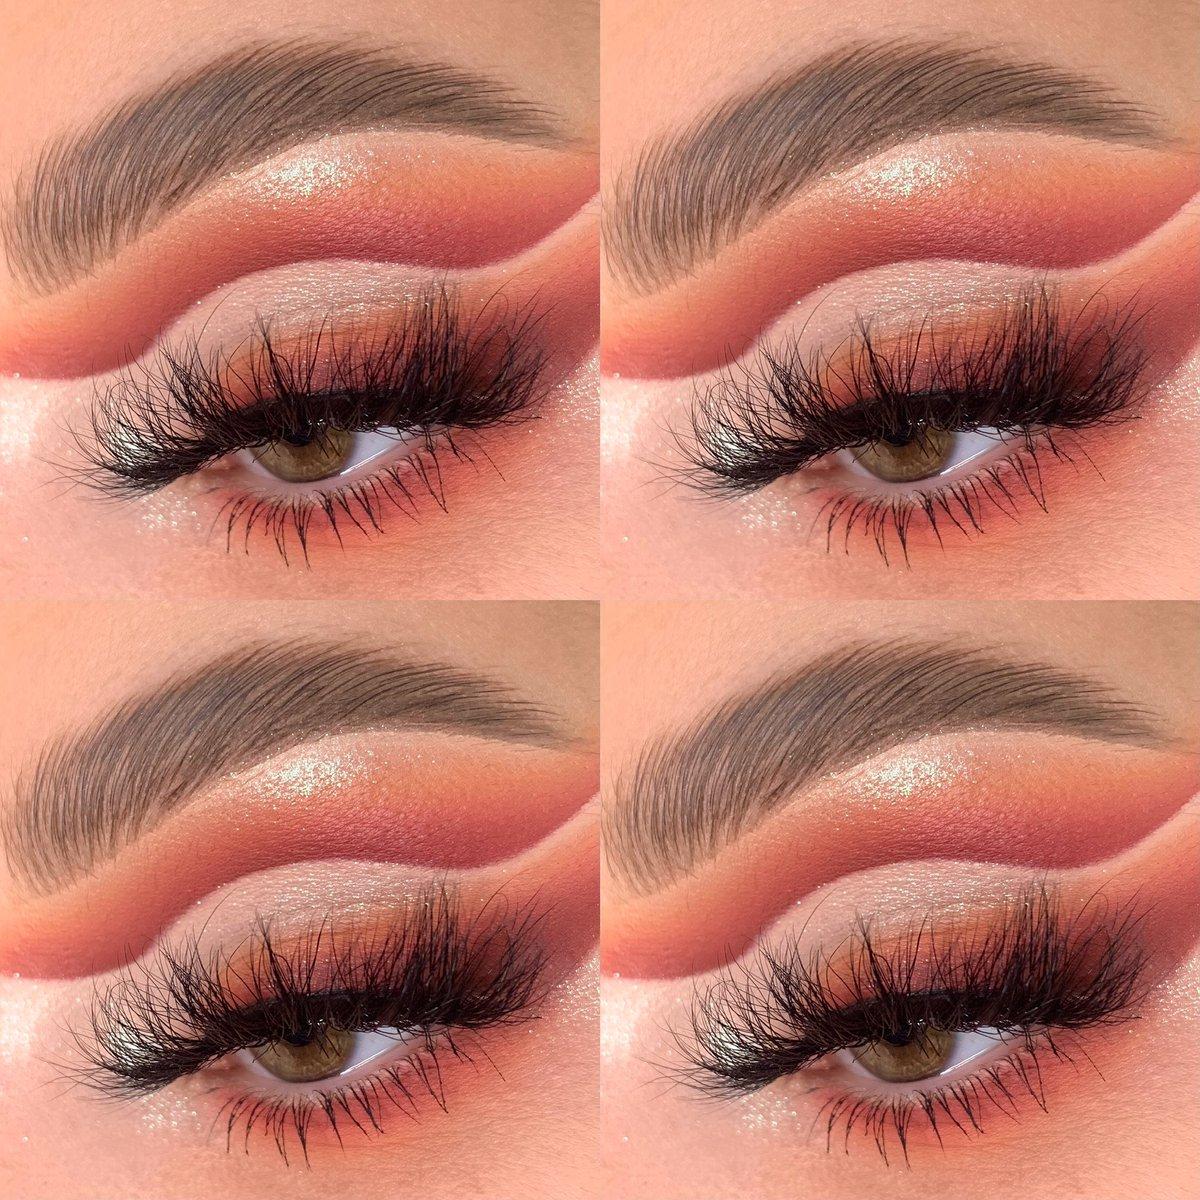 💋💋  @ABHcosmetics @HelenECosmetics @Primark @eyeconic @forevergoldenlashes #makeup #eyeshadow #beauty #makeuplooks